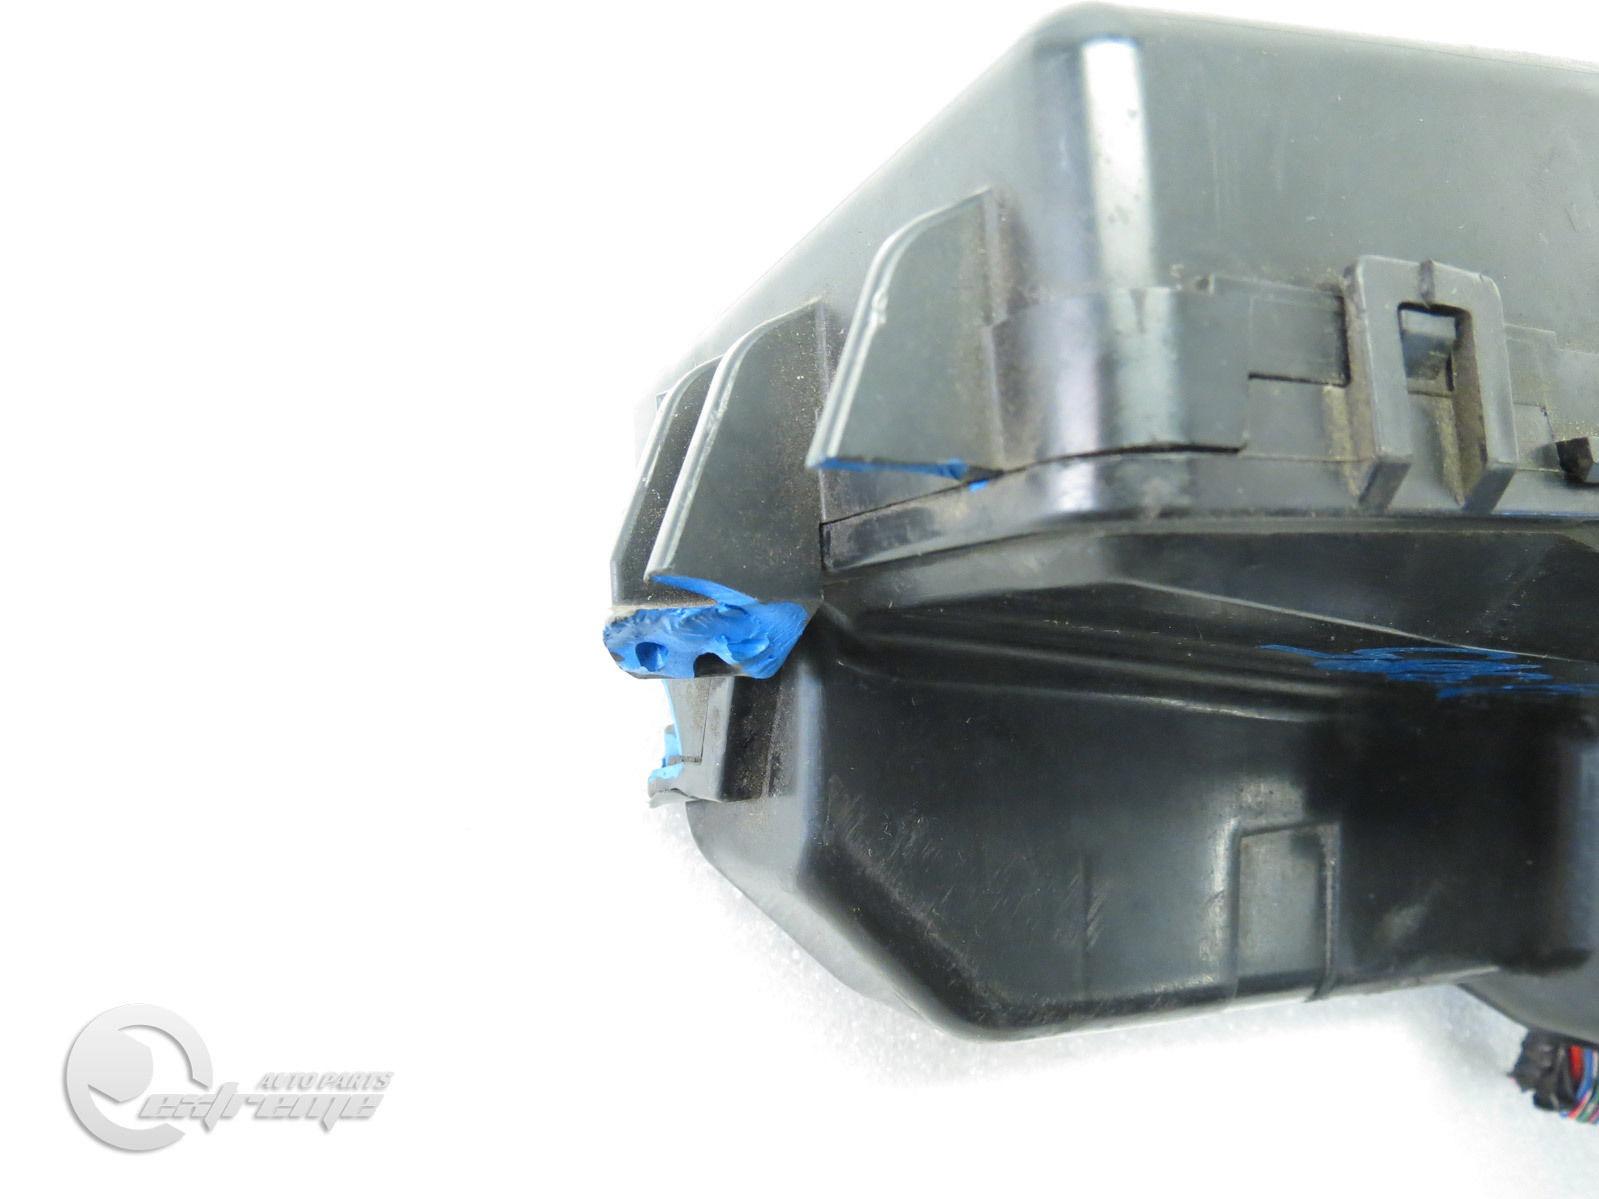 2005 honda accord fuse box diagram 3 phase transformer phasor under hood auto